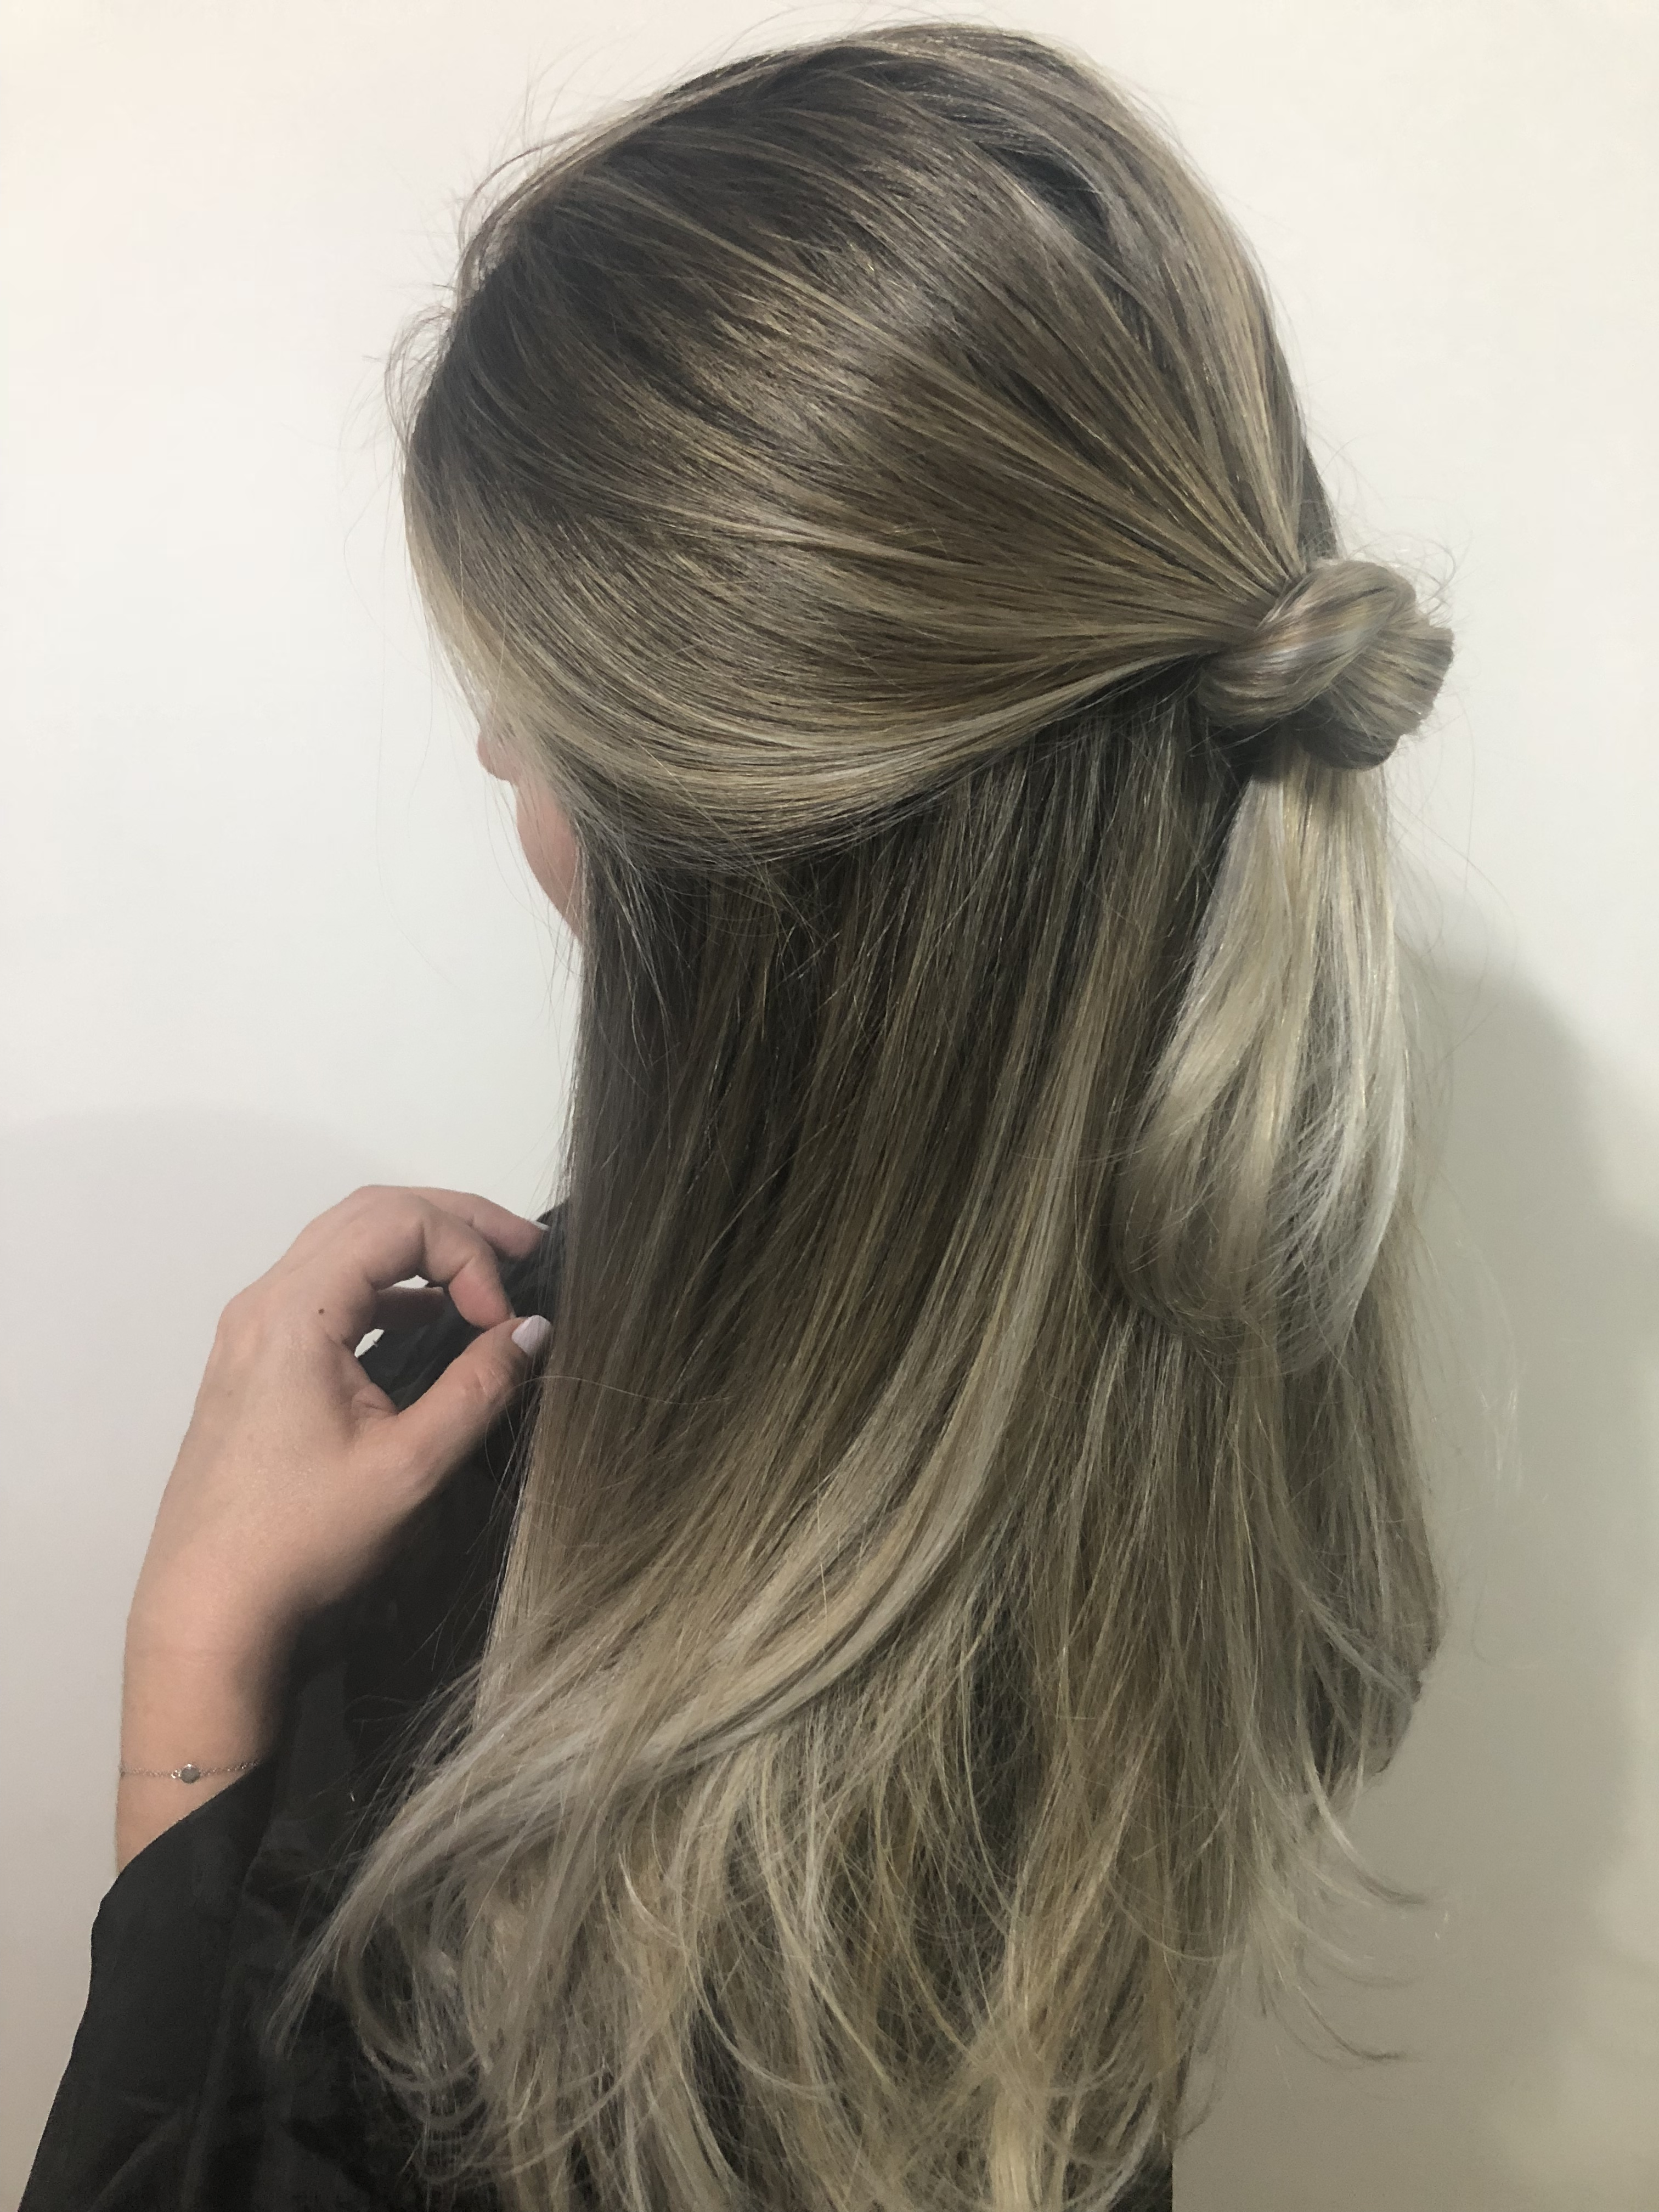 Loiro perolado  cabelo cabeleireiro(a) maquiador(a)